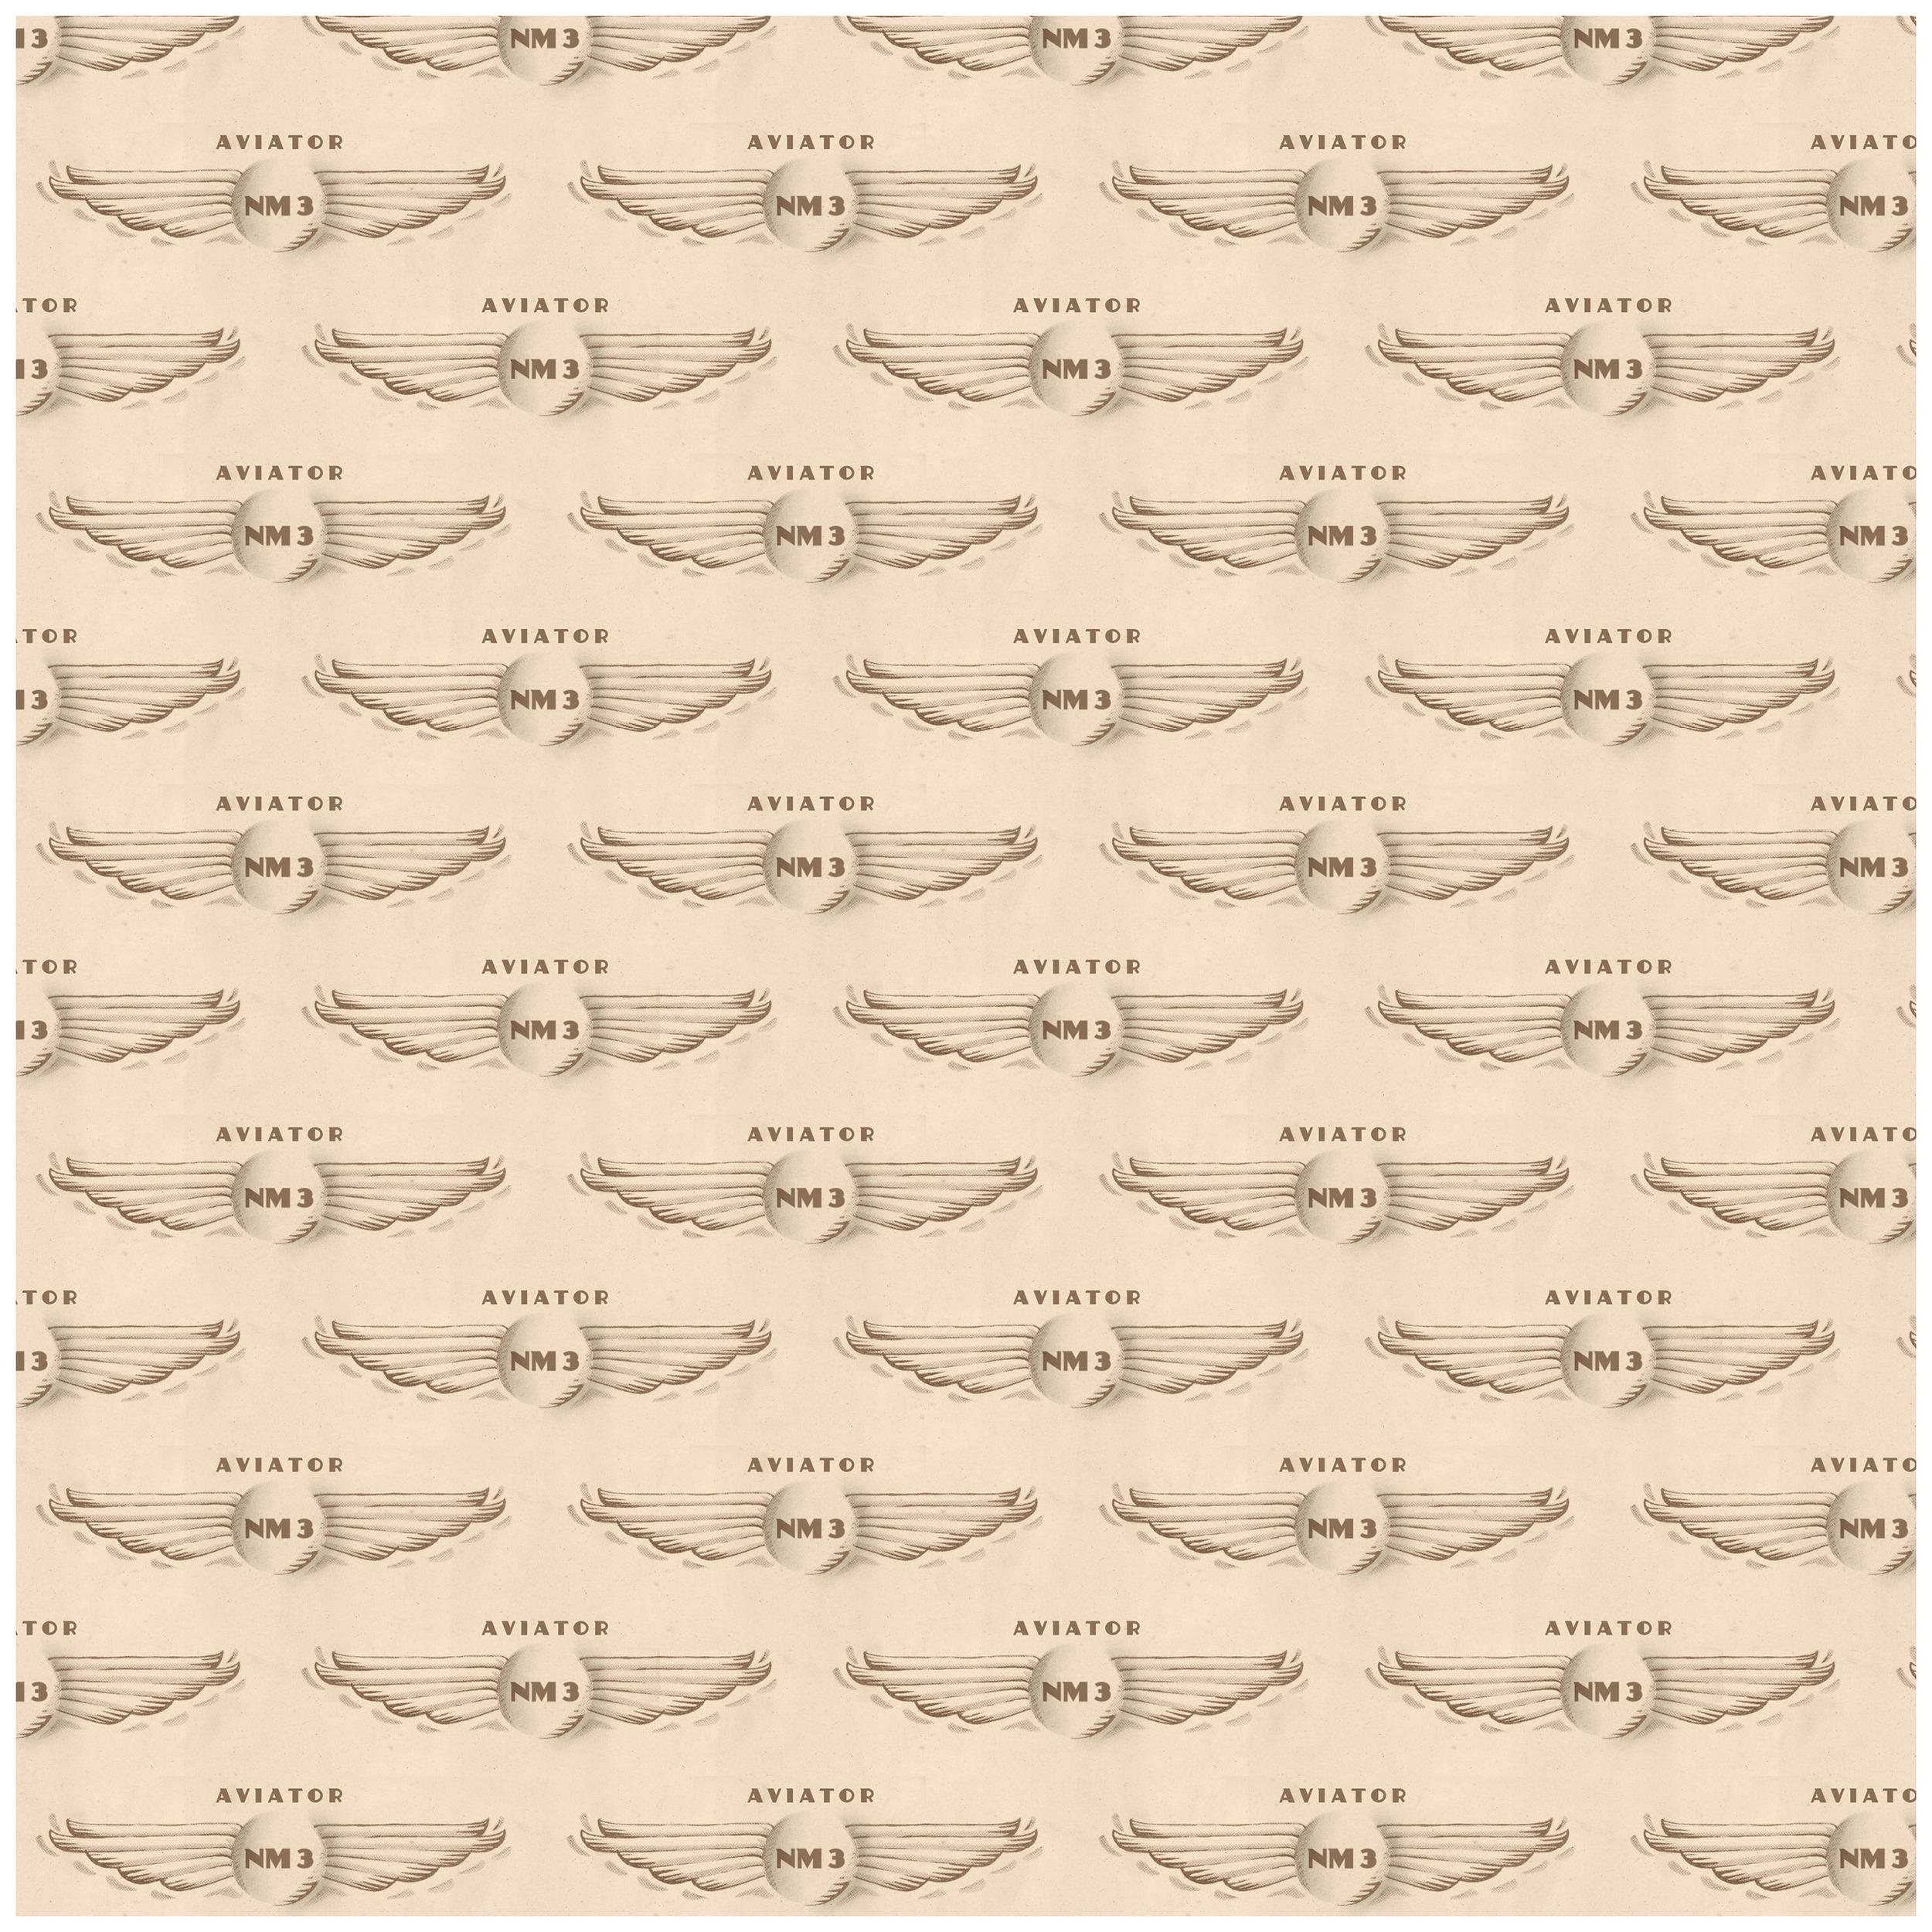 Aviator prints 1019146.jpg